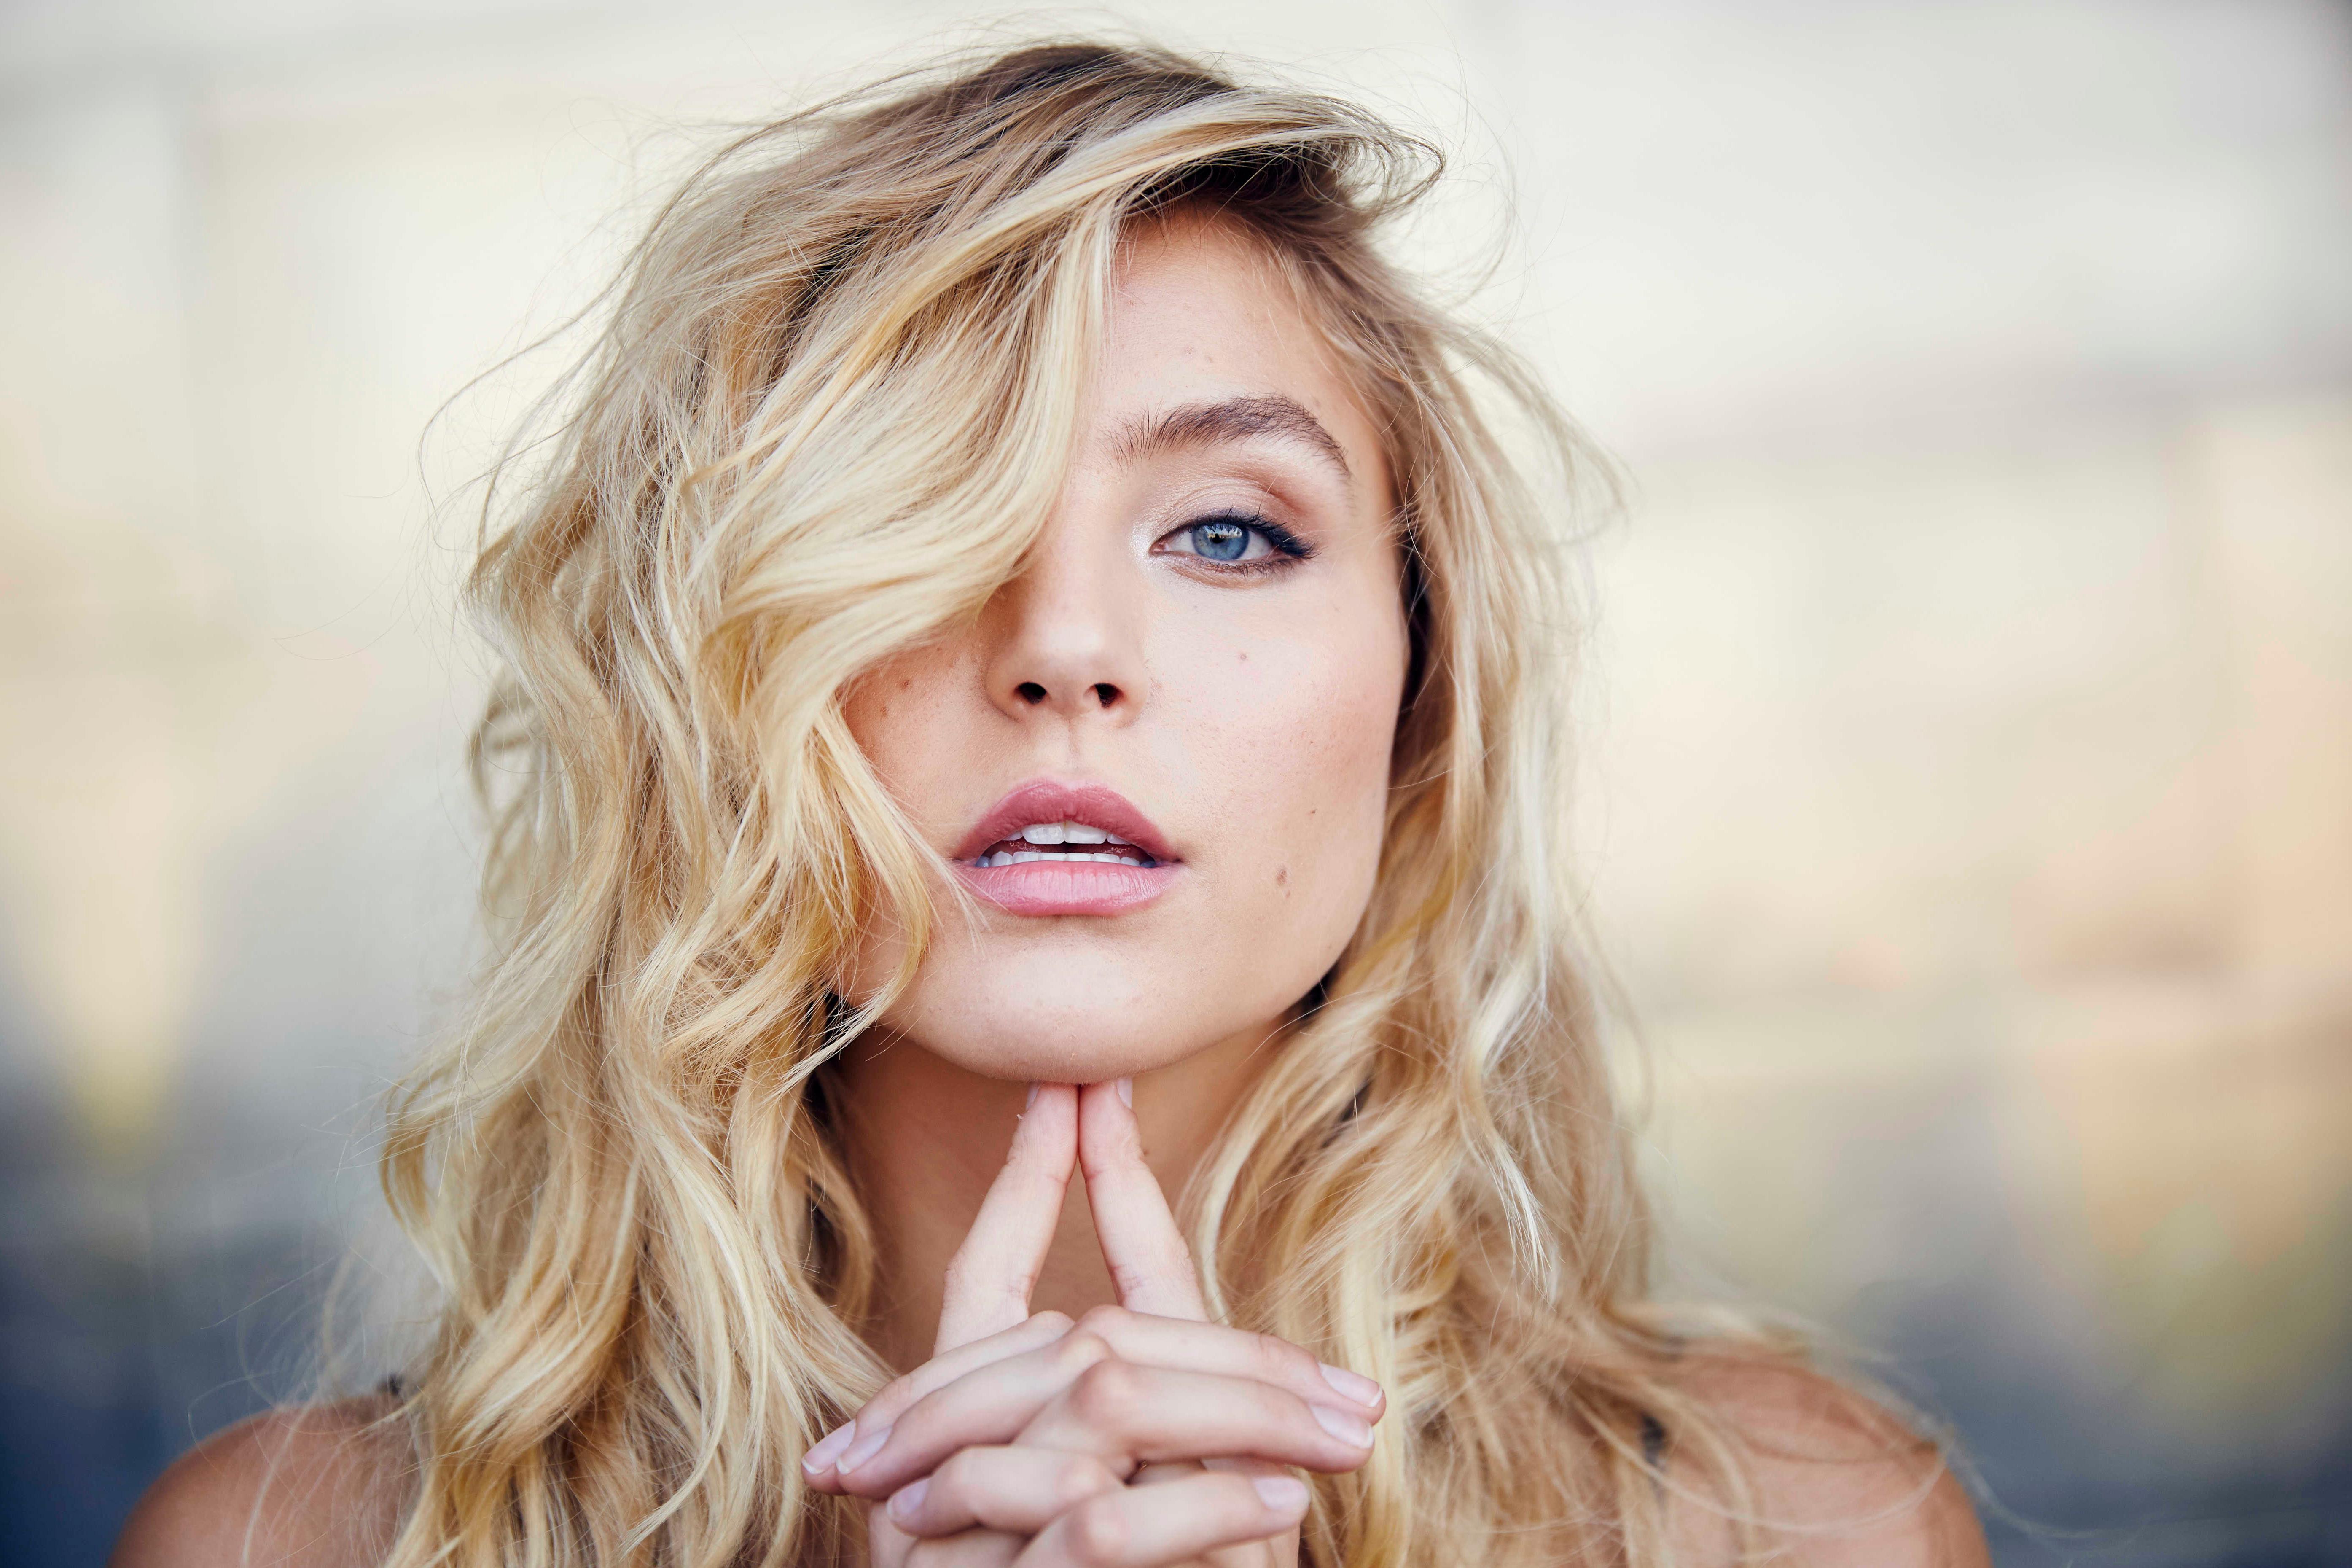 blonde hair girl 1575665261 - Blonde Hair Girl -